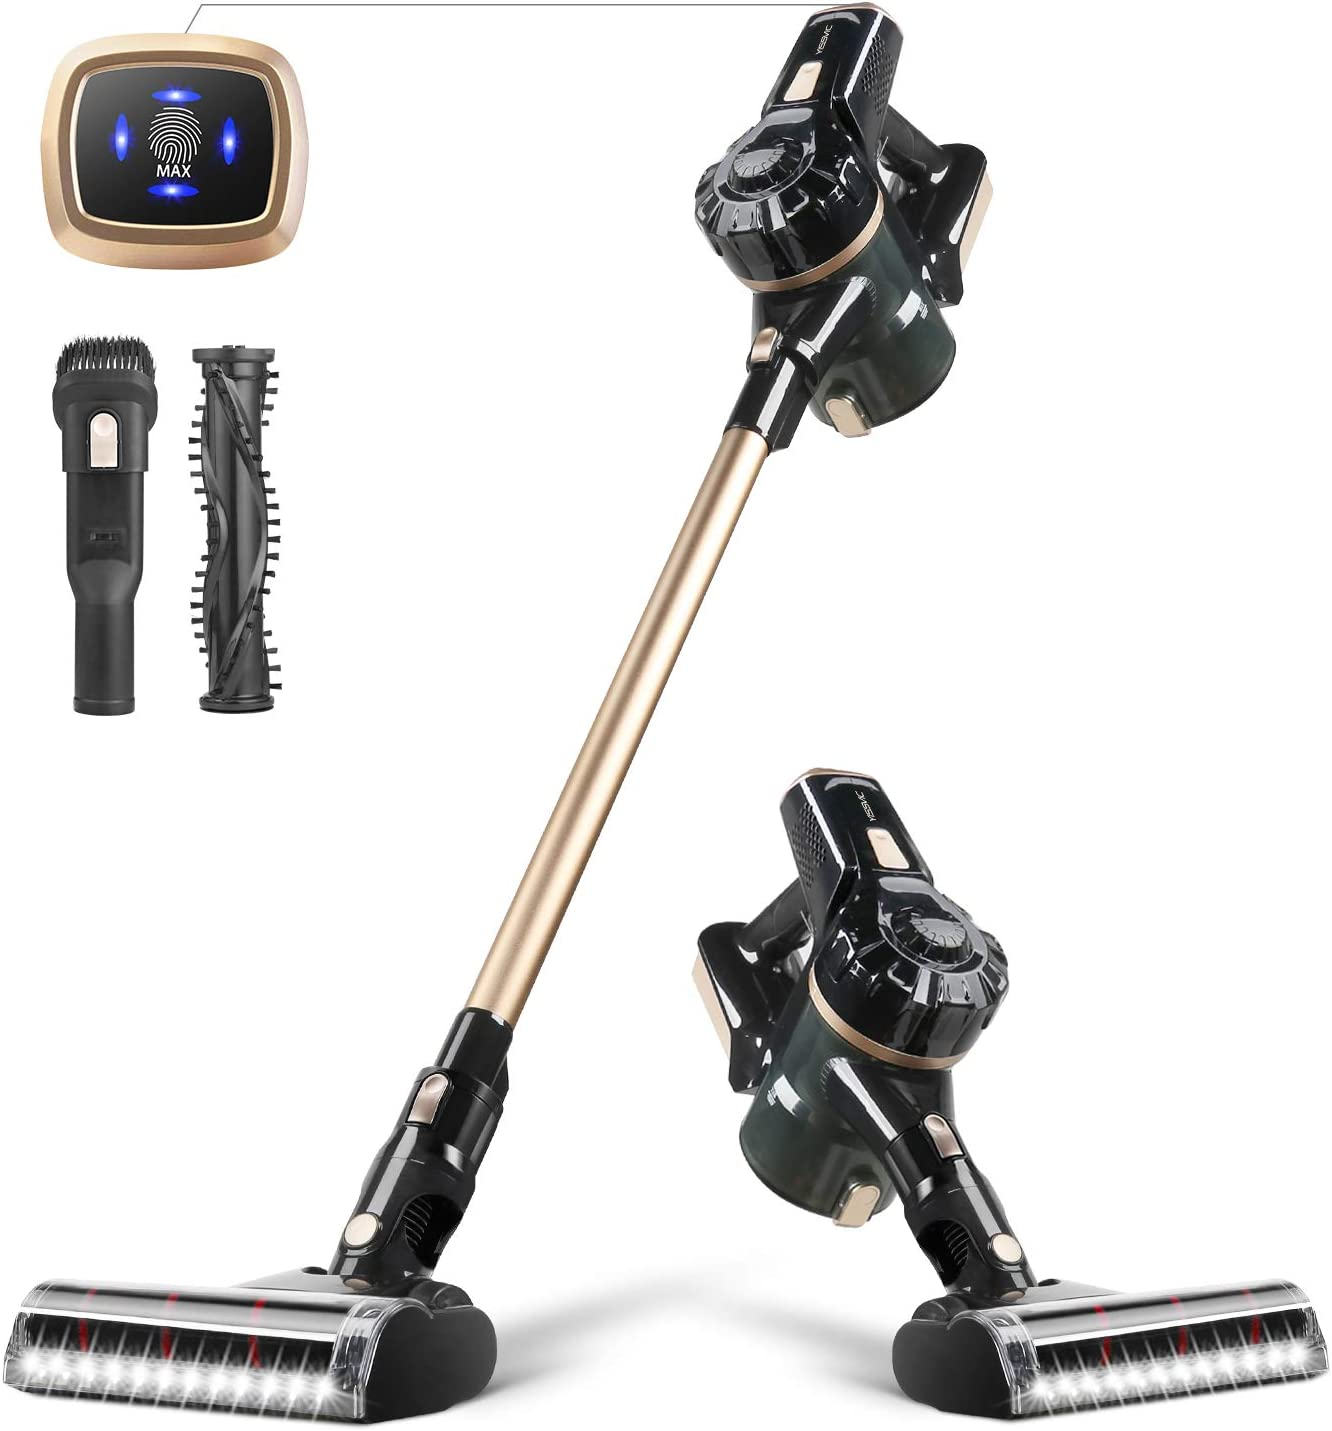 YISSVIC Cordless Vacuum 4 in 1 Stick Handheld Vacuum Cleaner 10Kpa Powerful Suction 2 Speed Control HEPA Filter Vacuum for Home Hard Floor Carpet Car Pet,Lightweight, BVC-S107